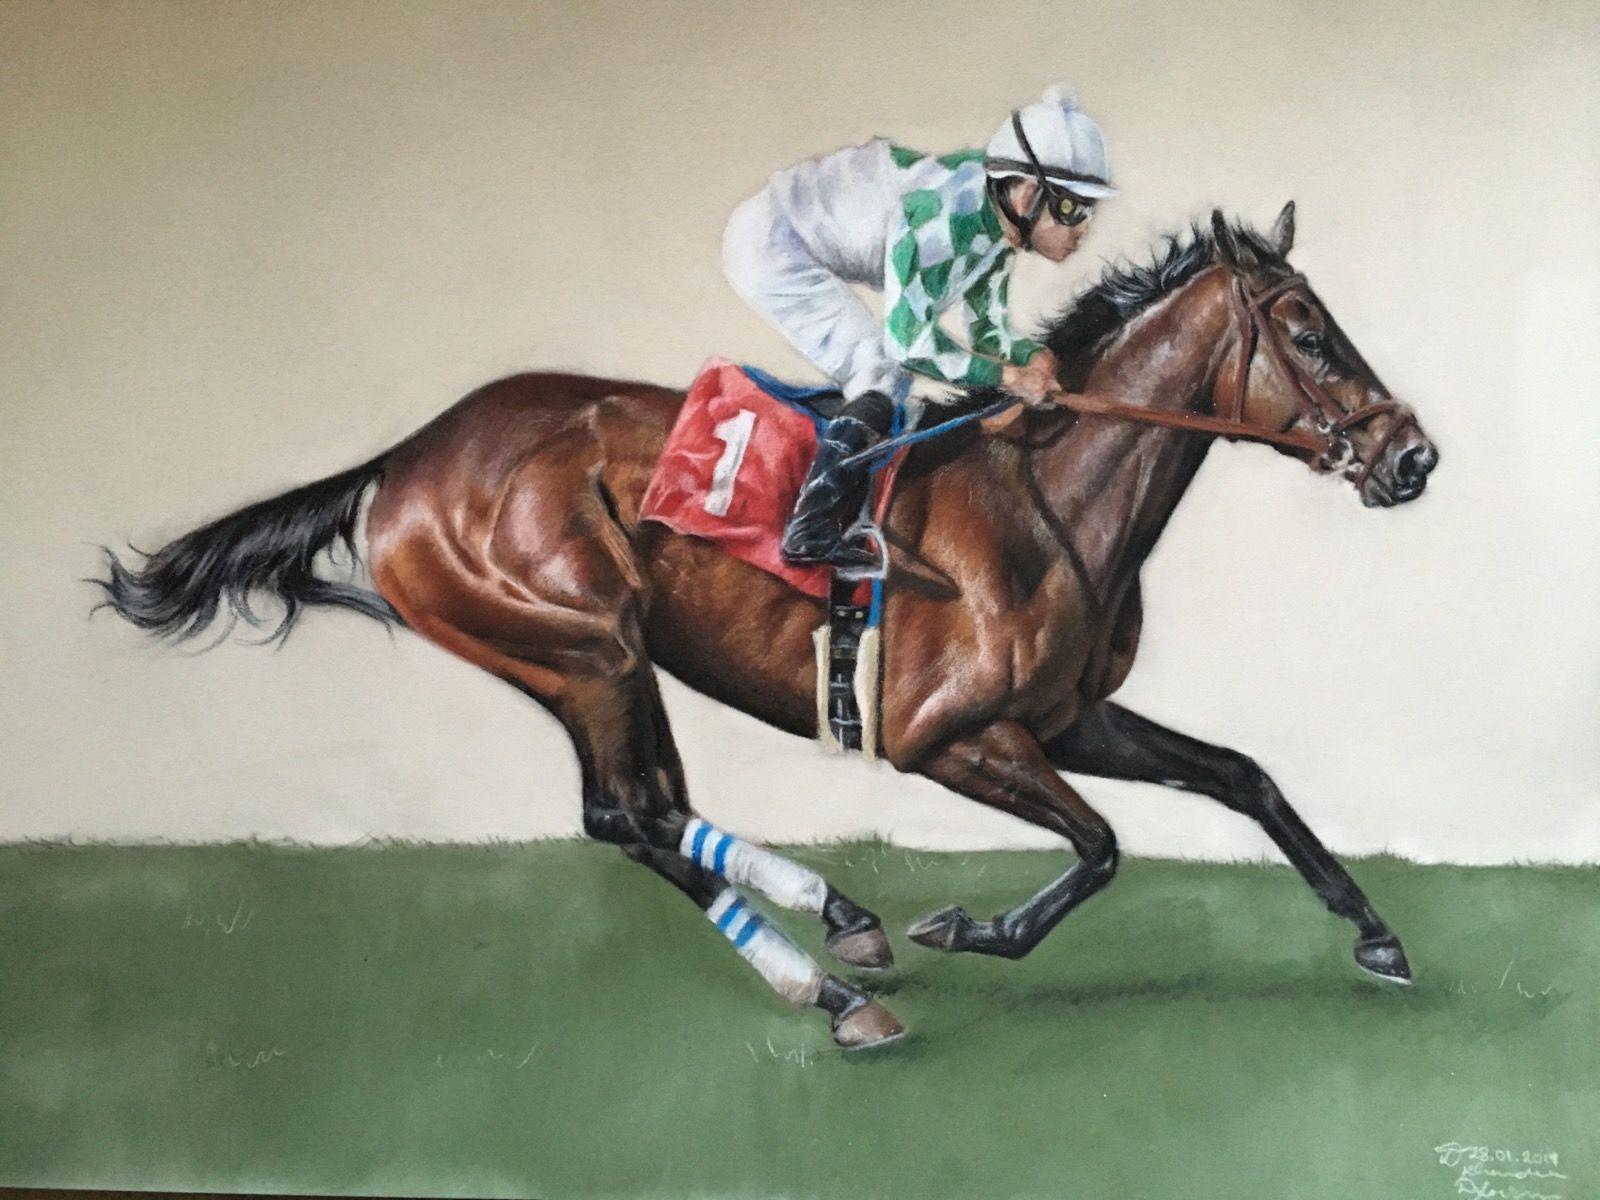 Horse racing, racing, thoroughbred, horse, jockey, horse riding